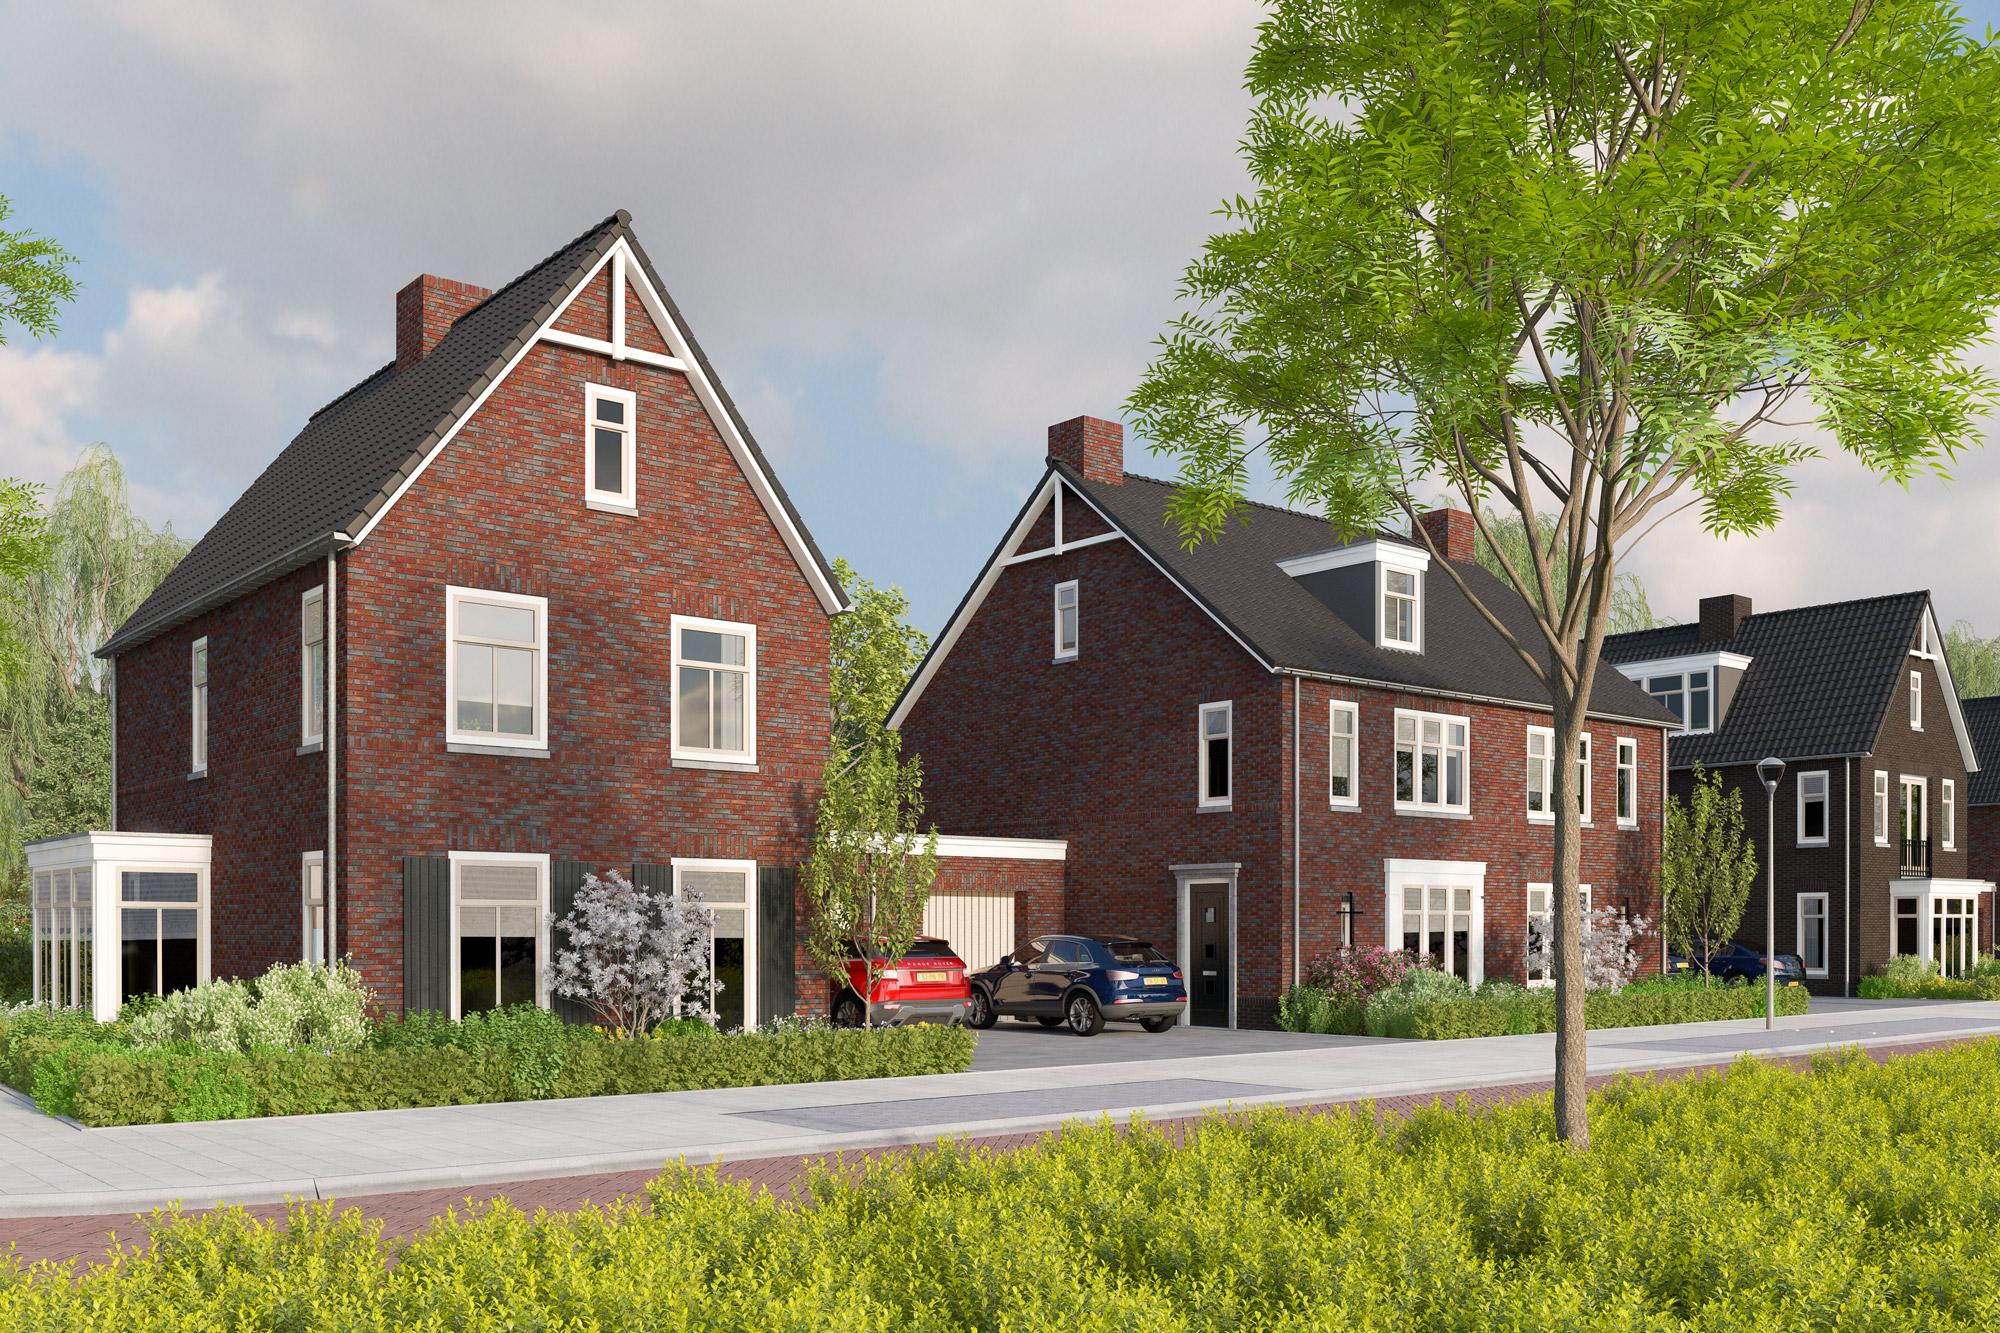 Huizen in de beljaart fase 3 for Huizenverkoop site